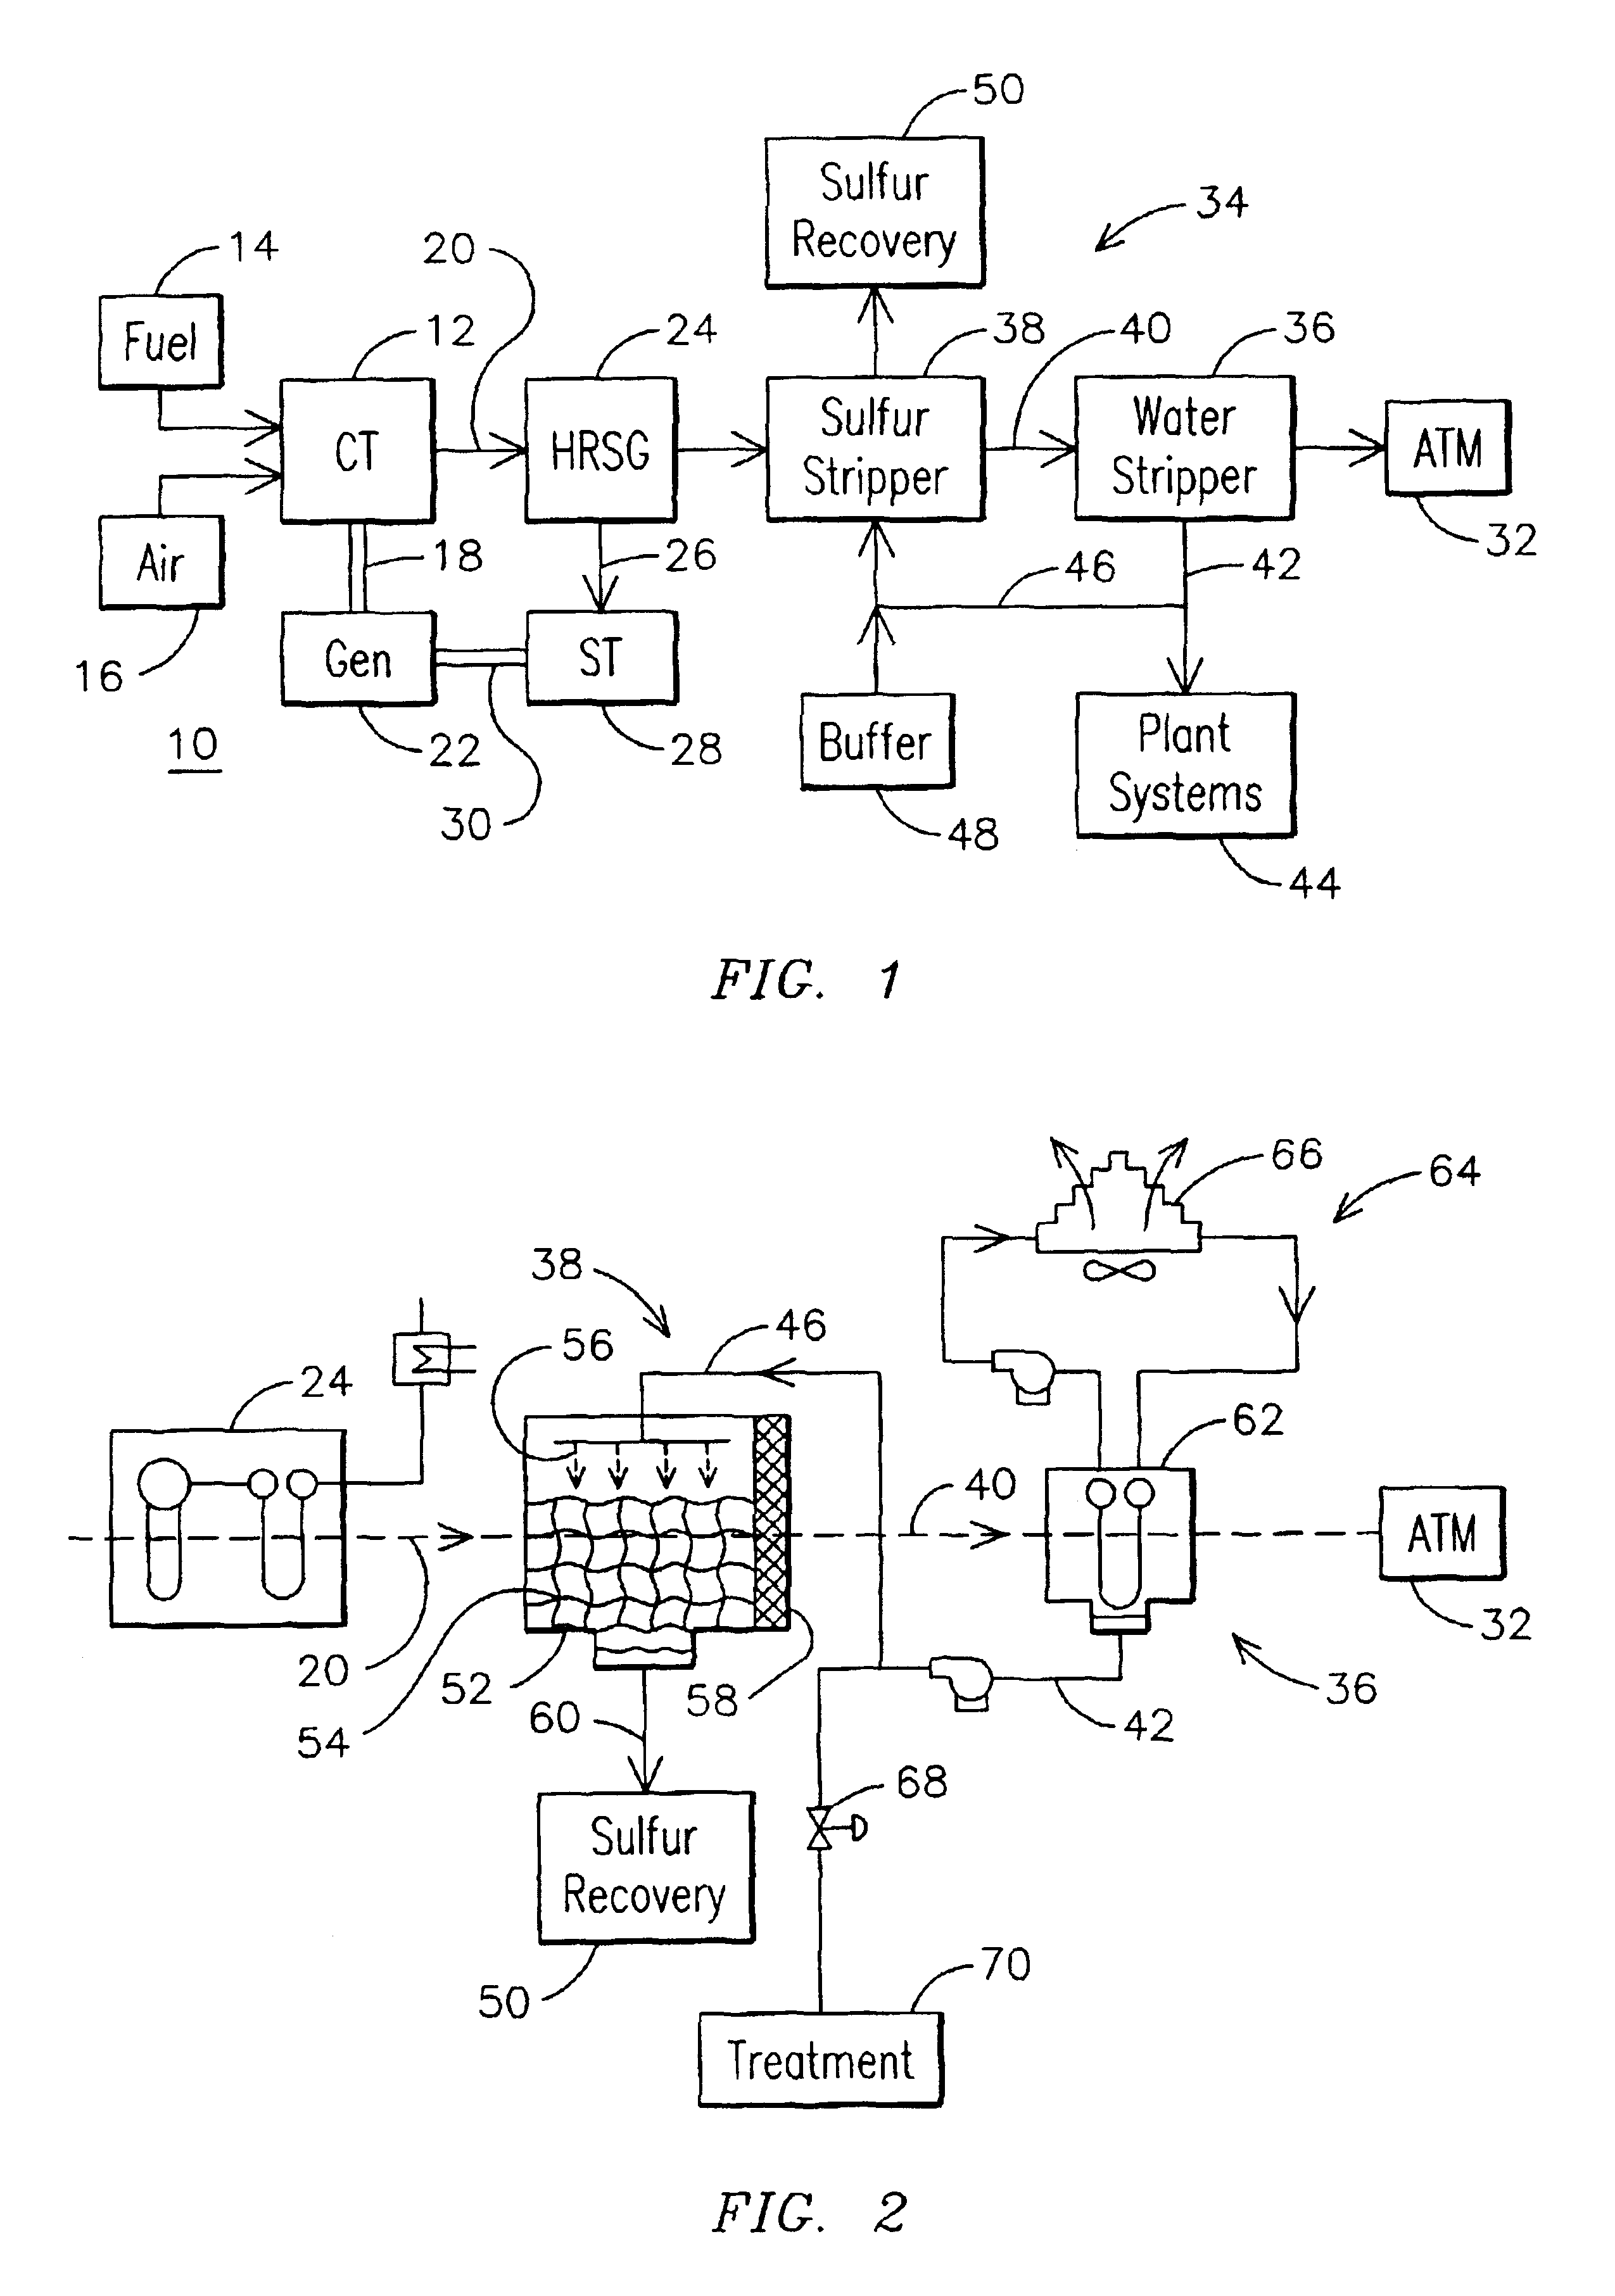 [diagram] 34988 robinair ac unit wiring diagram full ... robinair ac unit wiring diagram